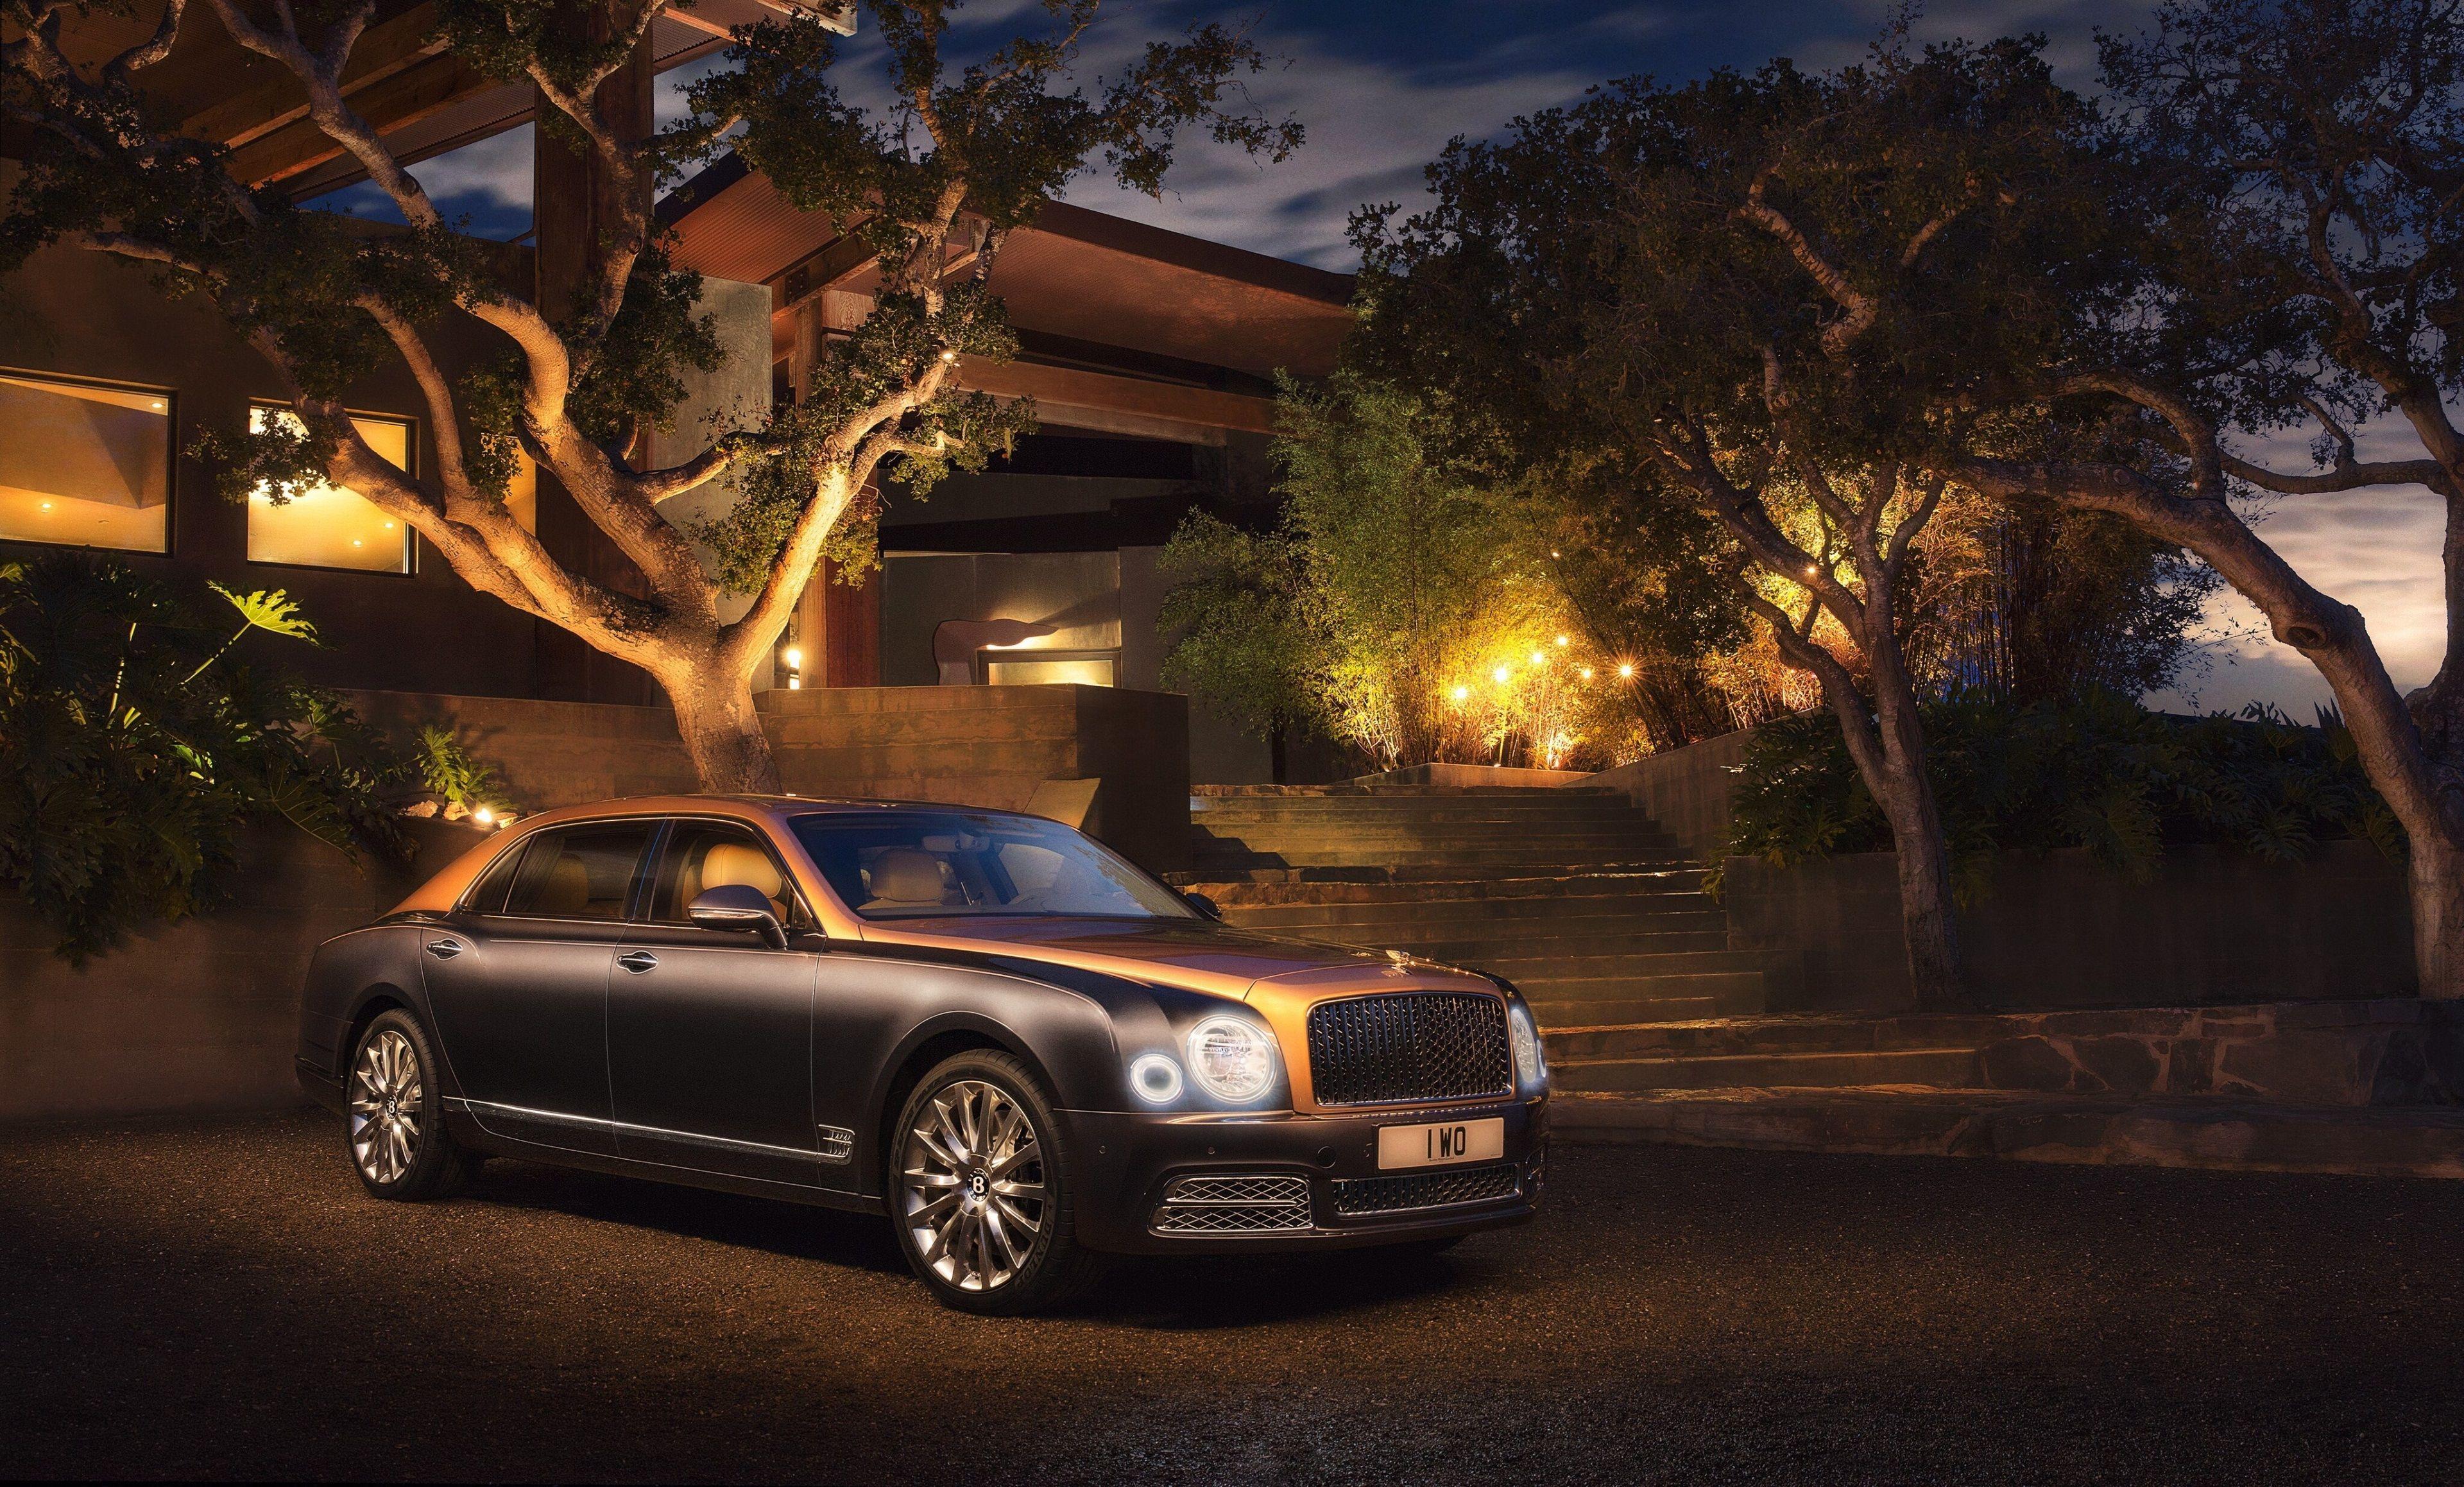 3840x2317 Bentley Mulsanne Extended Wheelbase 4k Hd High Quality